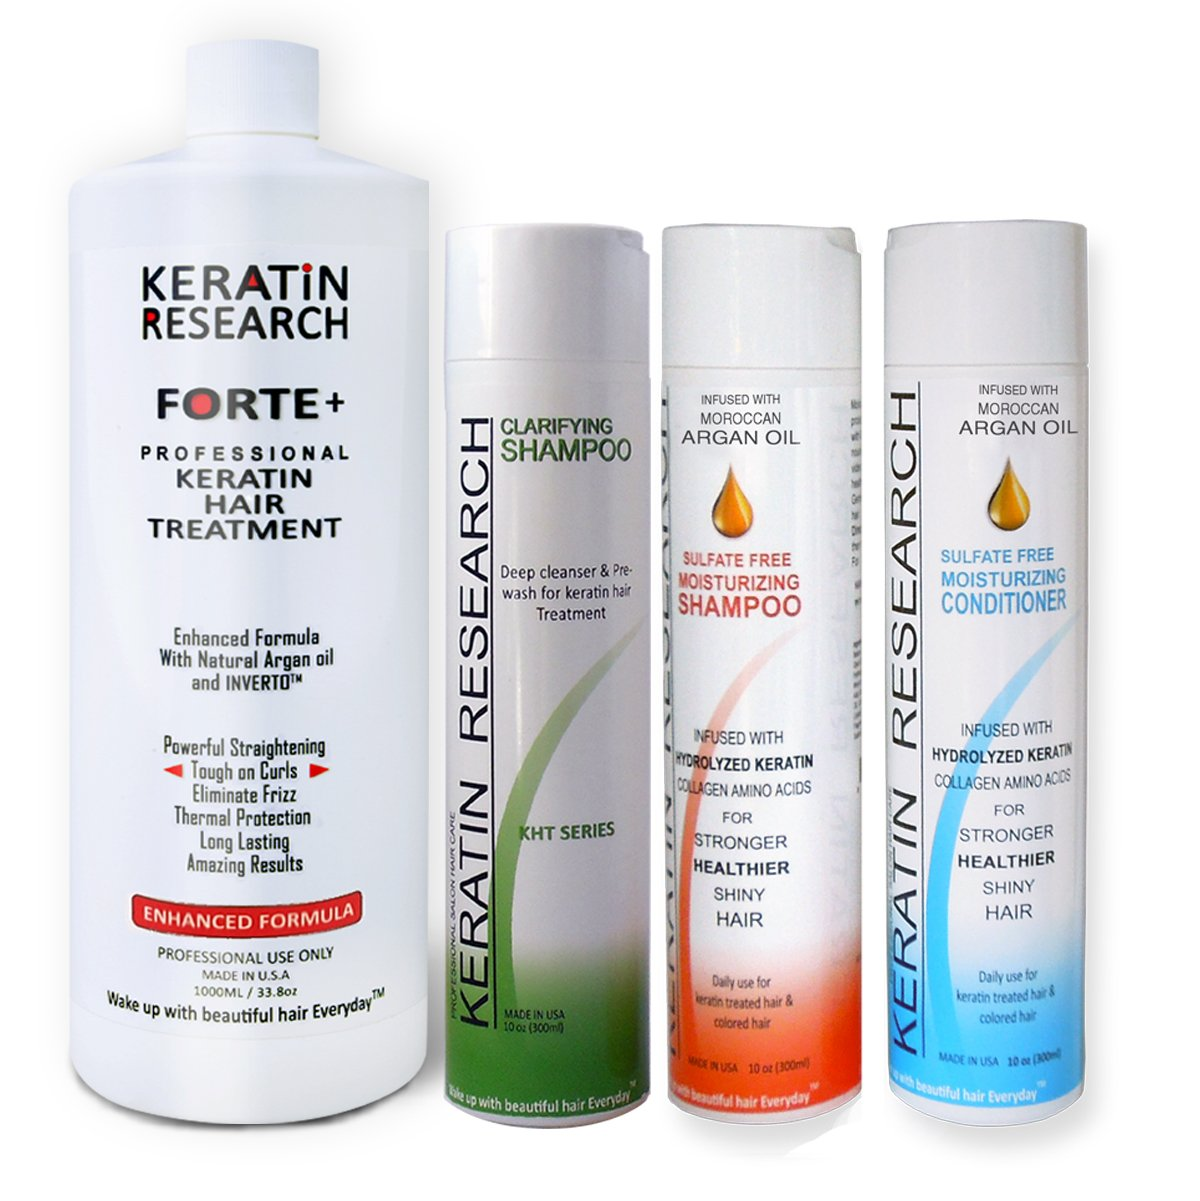 Keratin Forte Plus, Extra Strength Hair Treatment 4 Bottles 1000ml Kit by Keratin Research (Image #1)